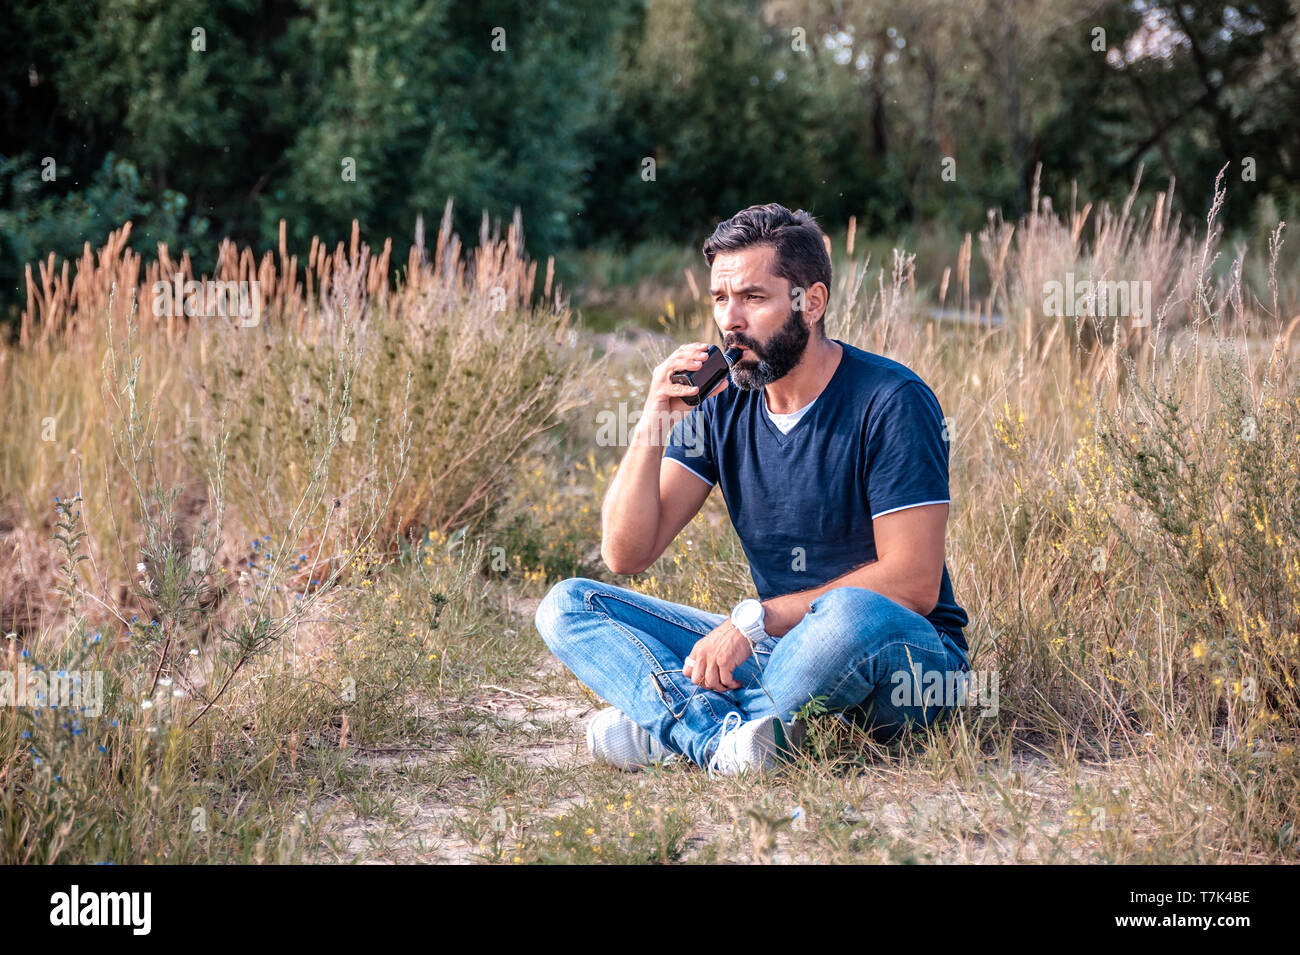 Stylish bearded vape man smokes e-cigarette exhales smoke on the ground. Electronic cigarette as alternative to tobacco. - Stock Image